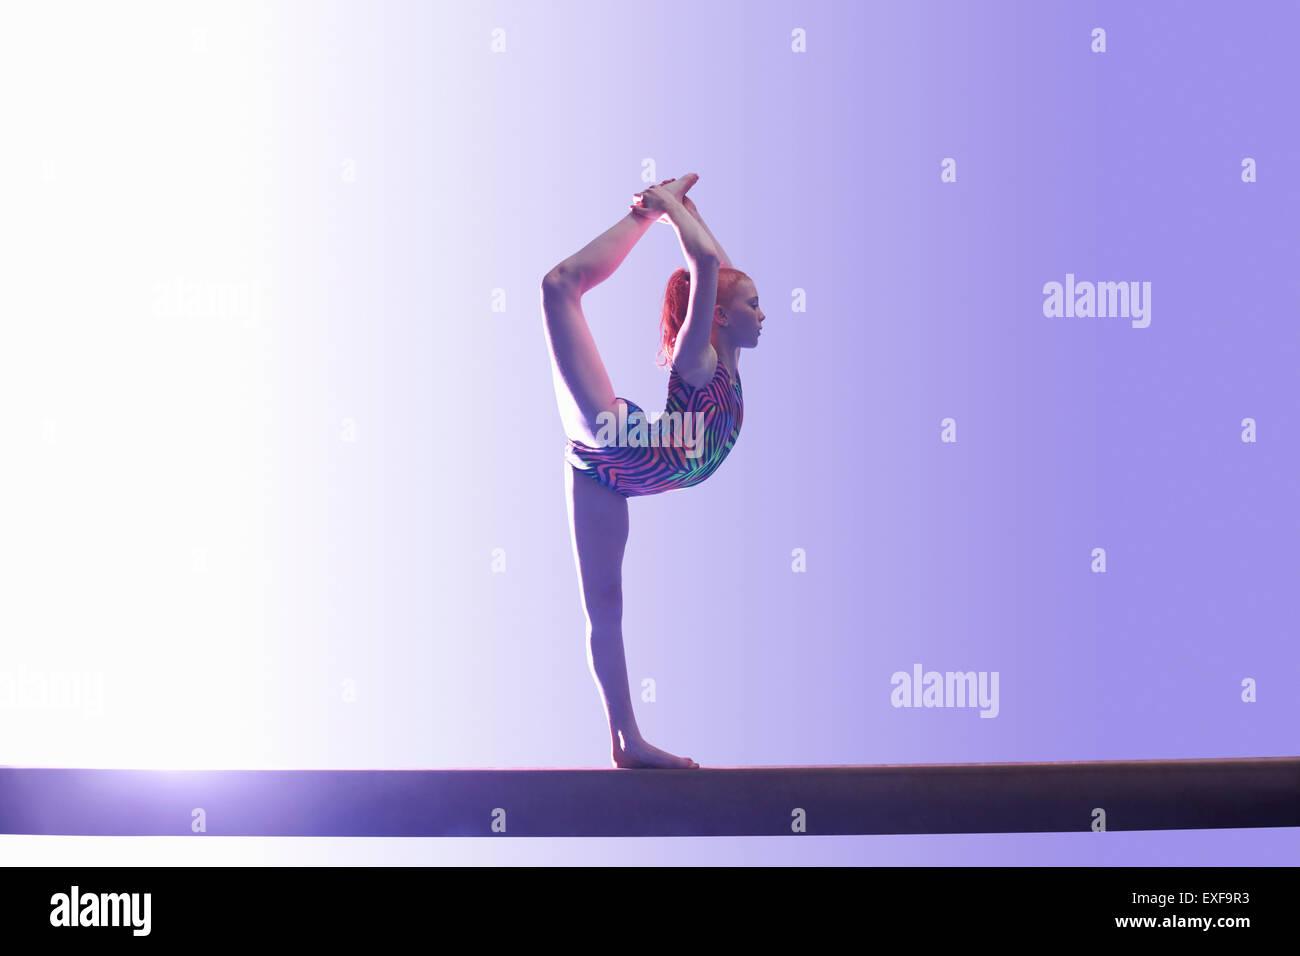 Young gymnast performing on balance beam - Stock Image